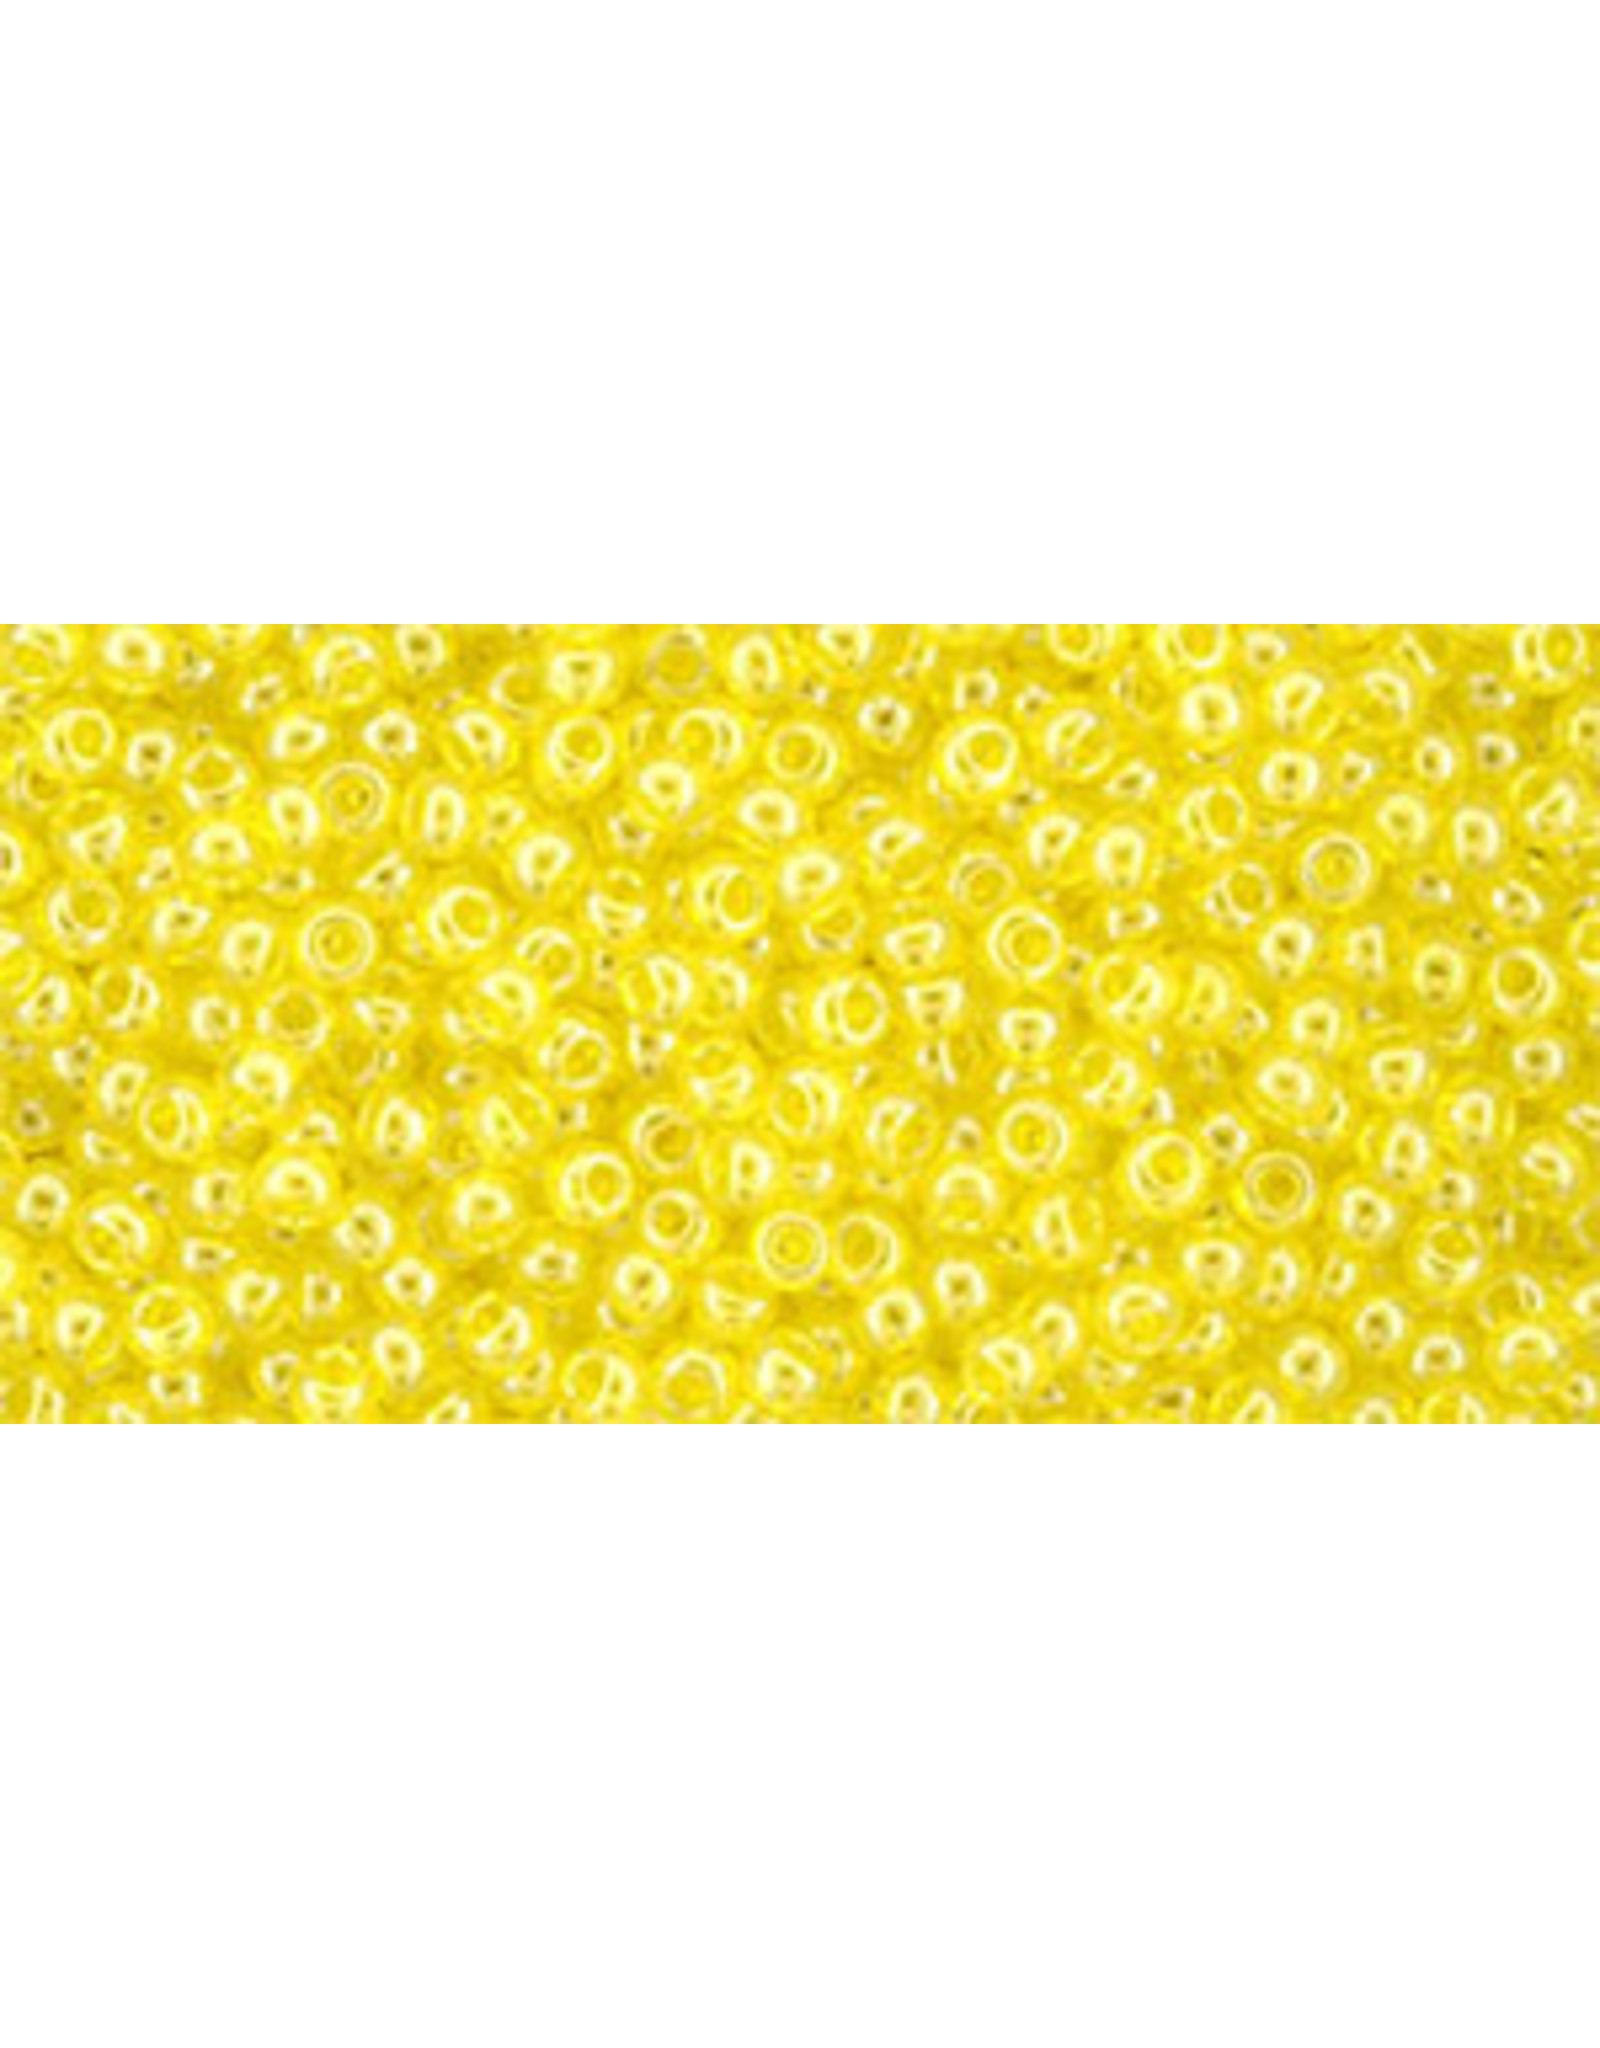 Toho 102B 11  Round 40g  Transparent Yellow Rose Lustre